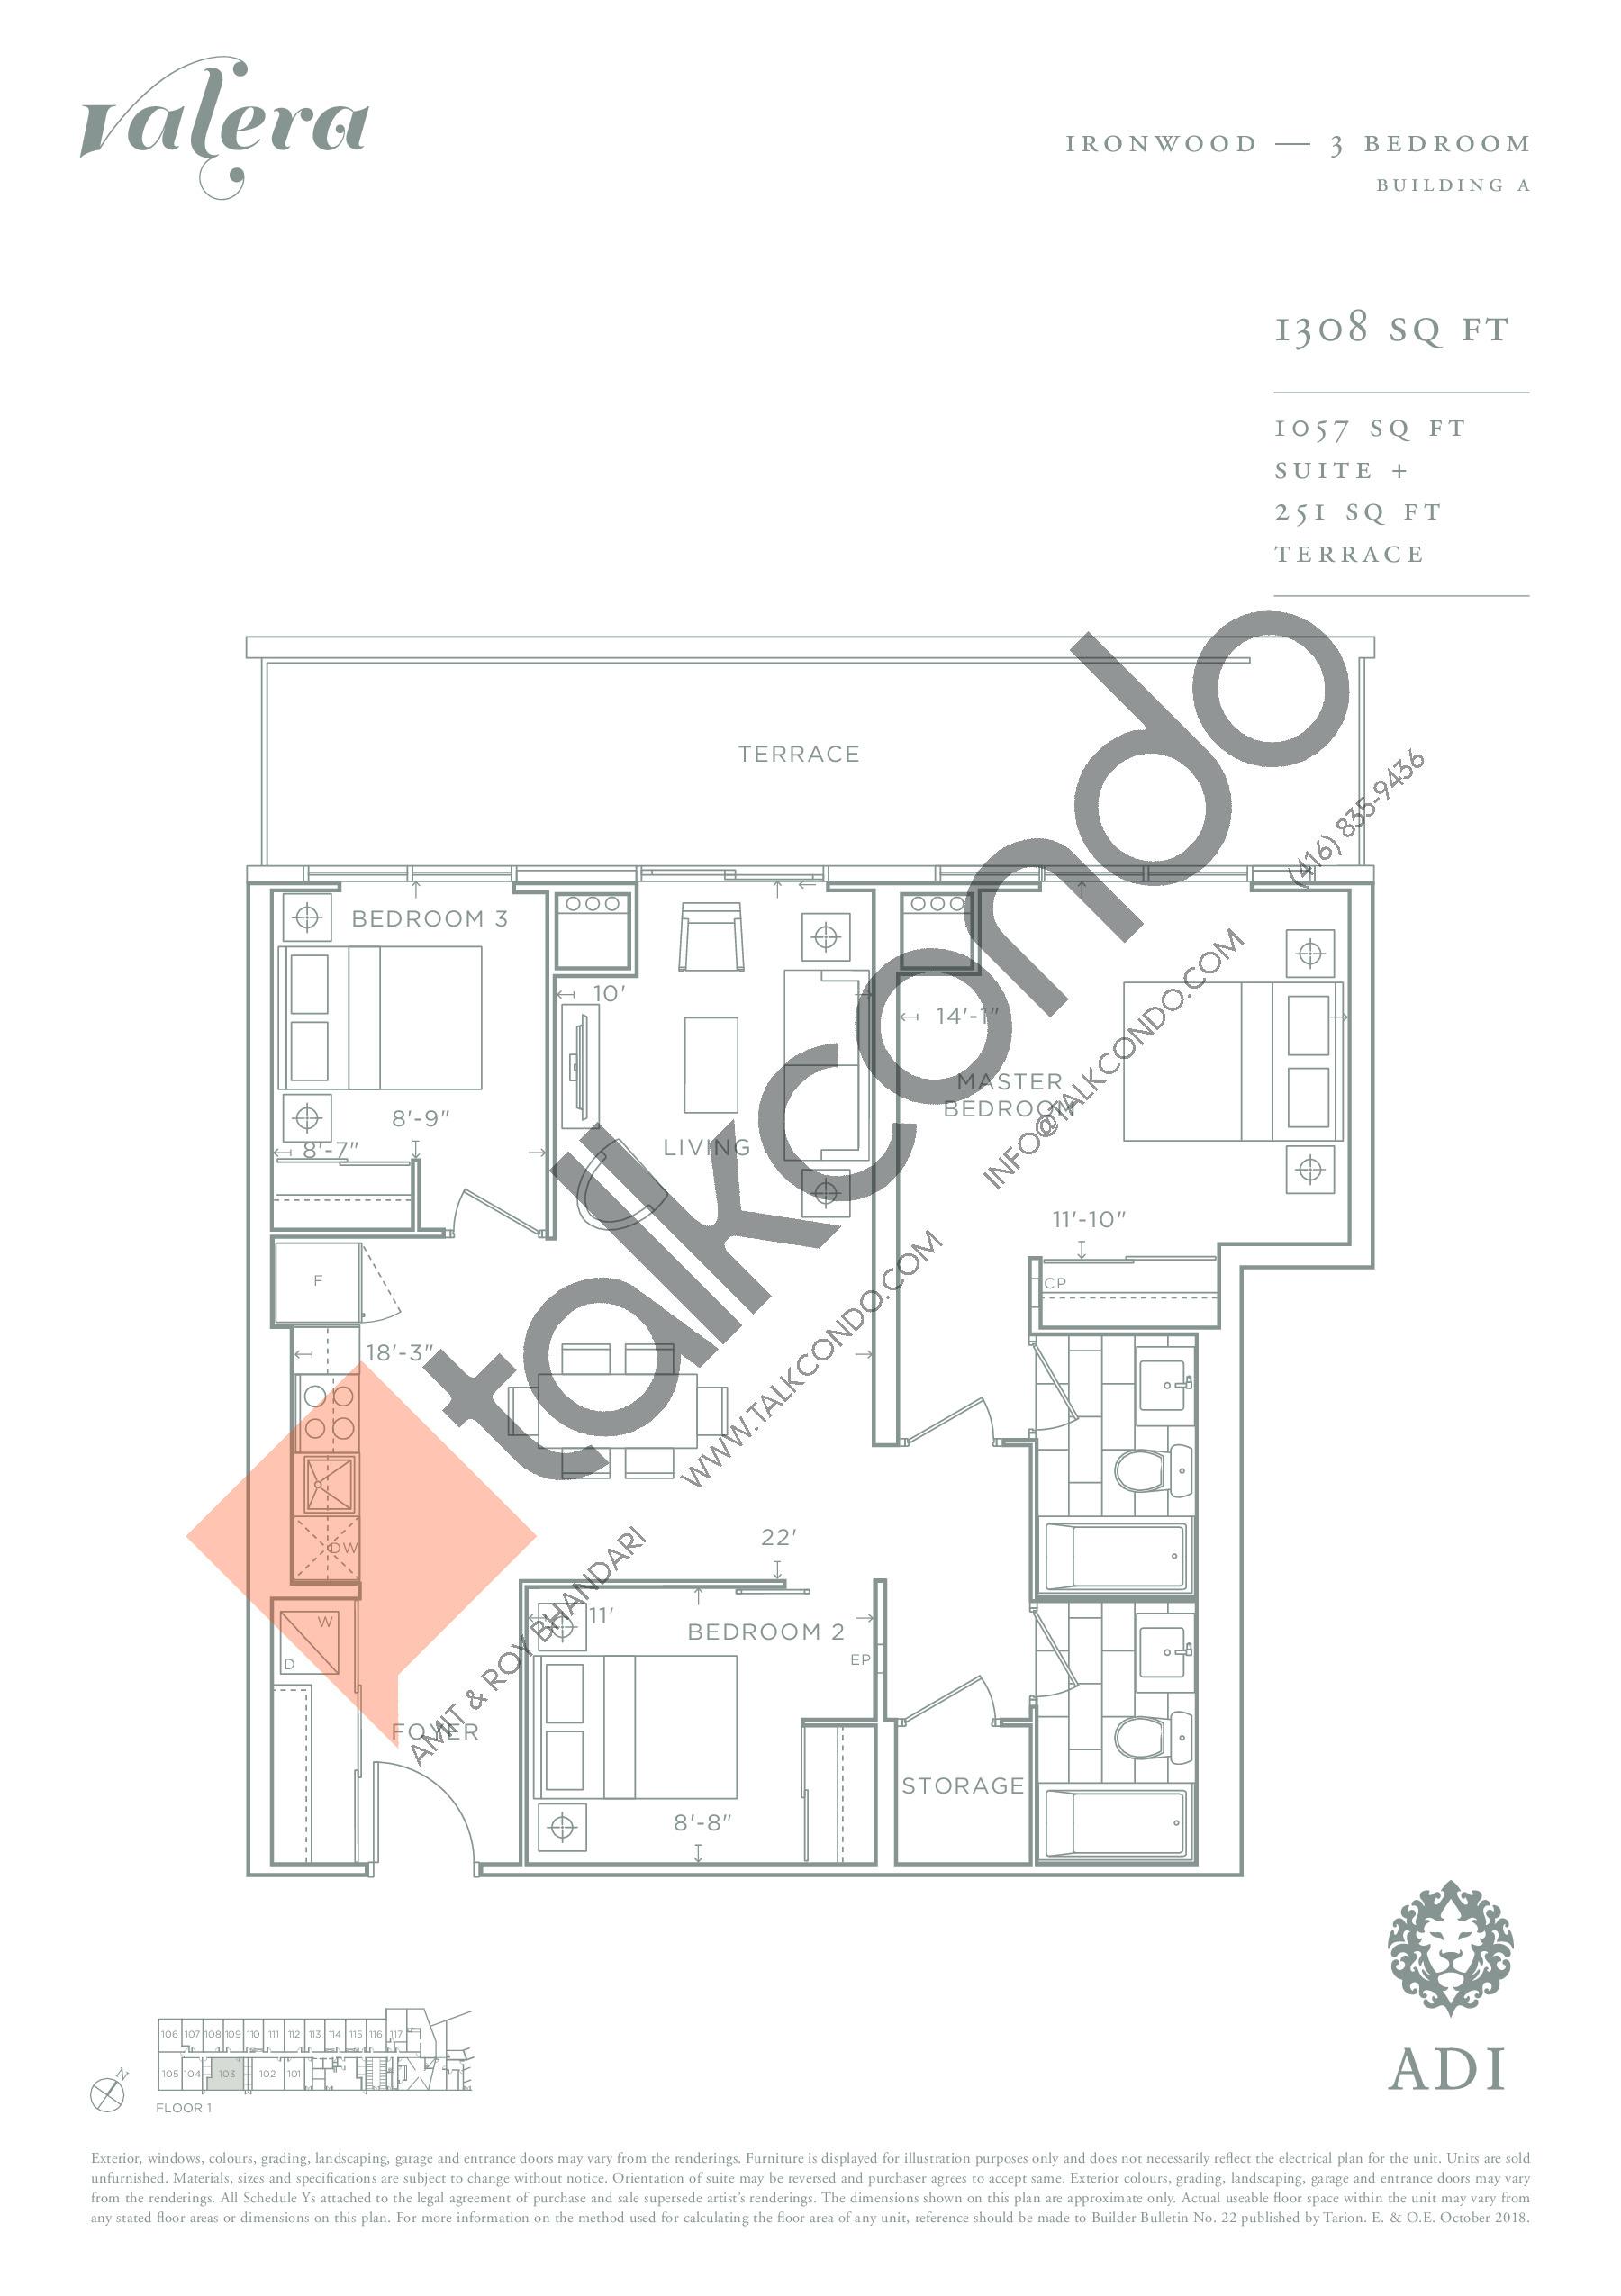 Ironwood Floor Plan at Valera Condos - 1057 sq.ft